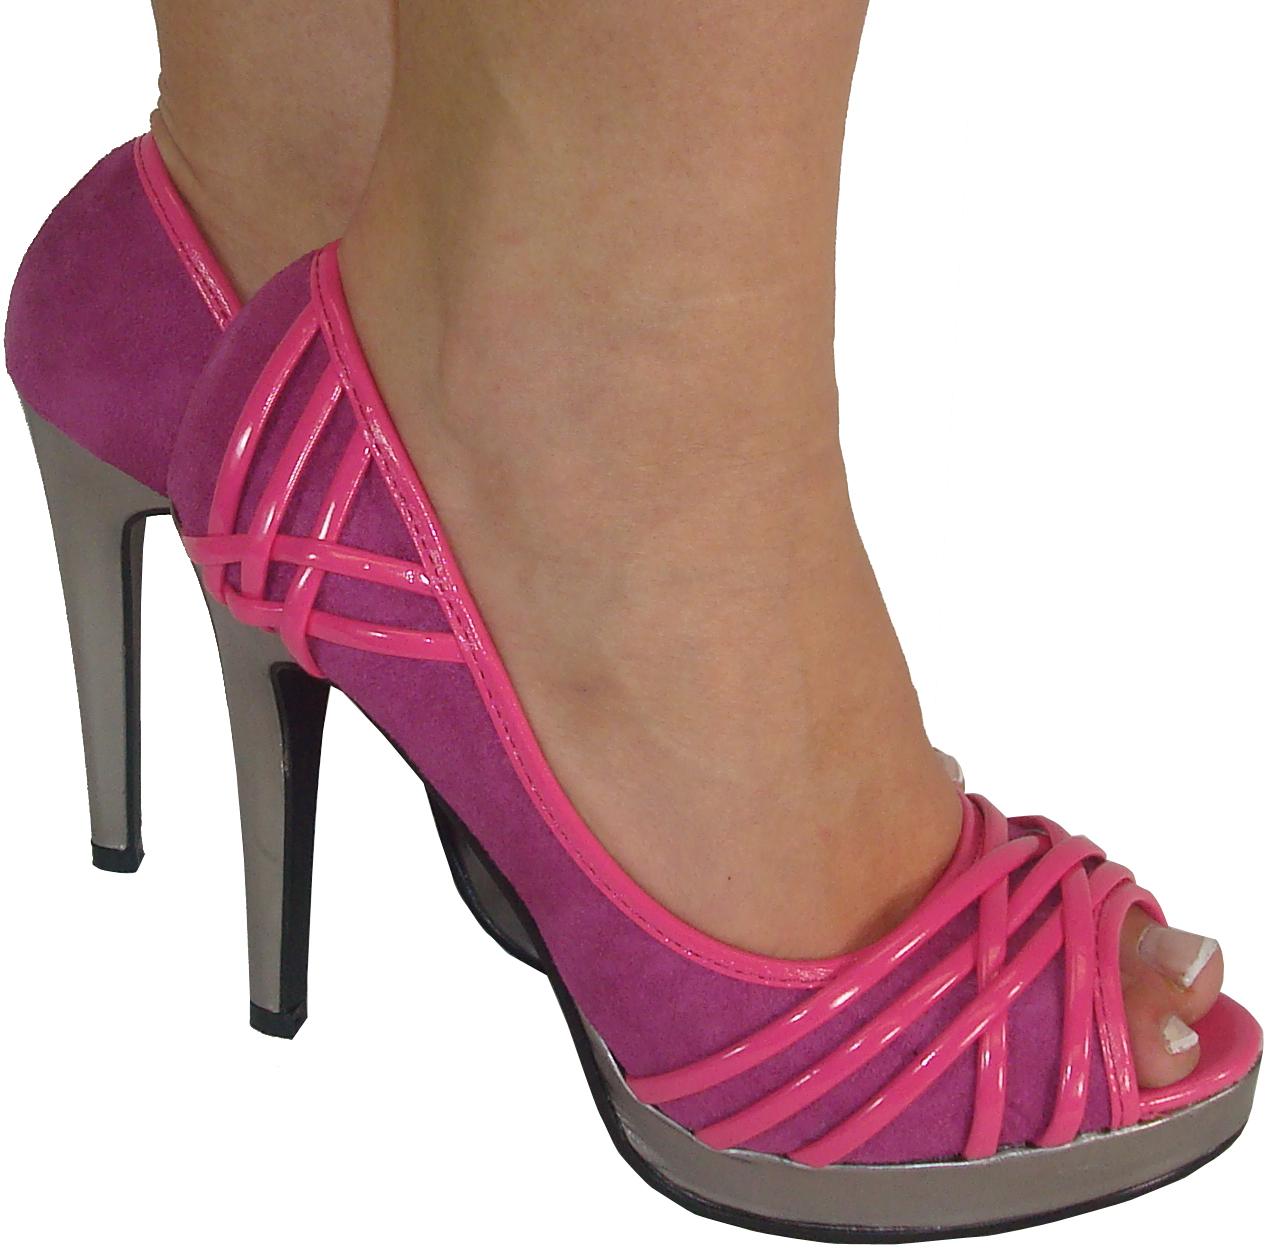 Details about new womens pink peep platform ladies heels shoes sze 8